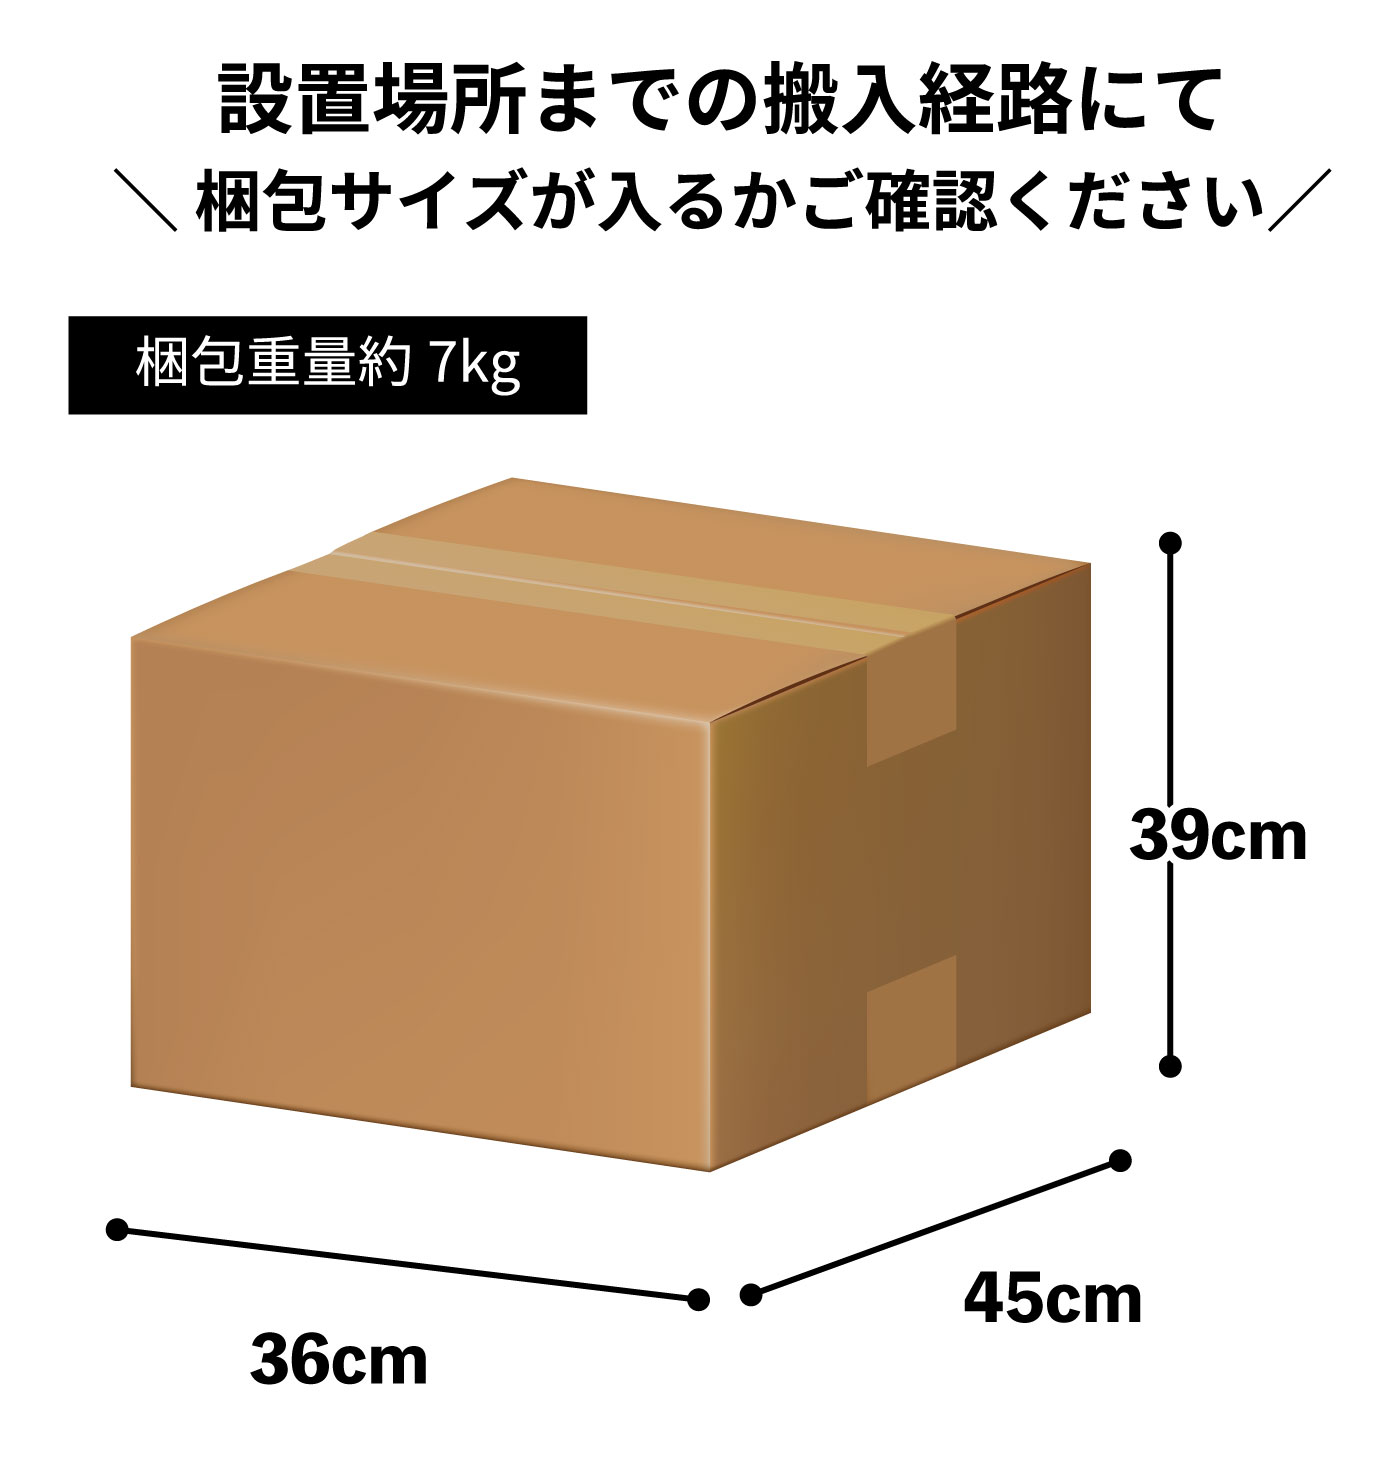 DK-003Bの梱包サイズ